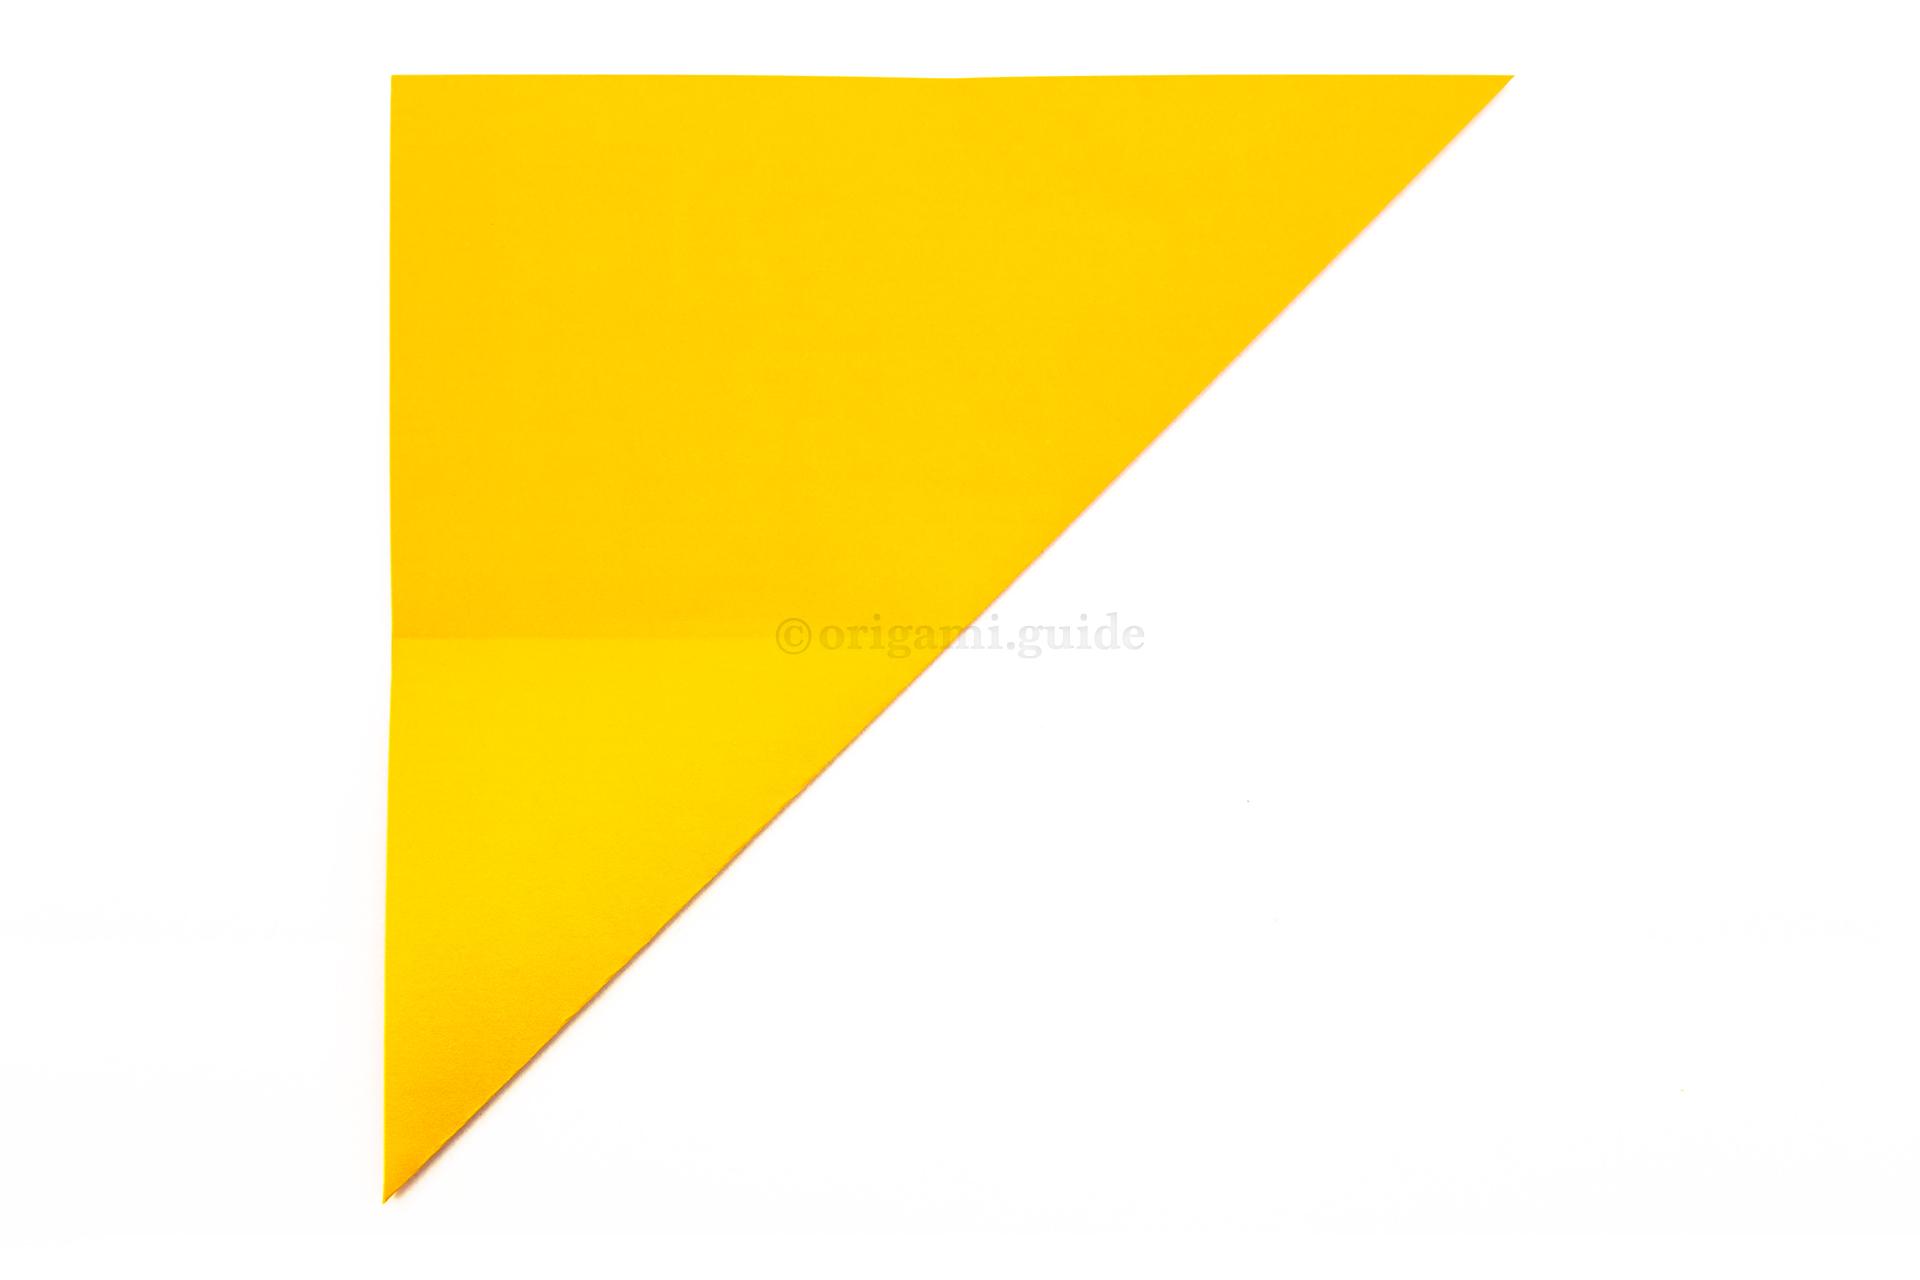 Origami fish instructions - Tavin's Origami | 1280x1920